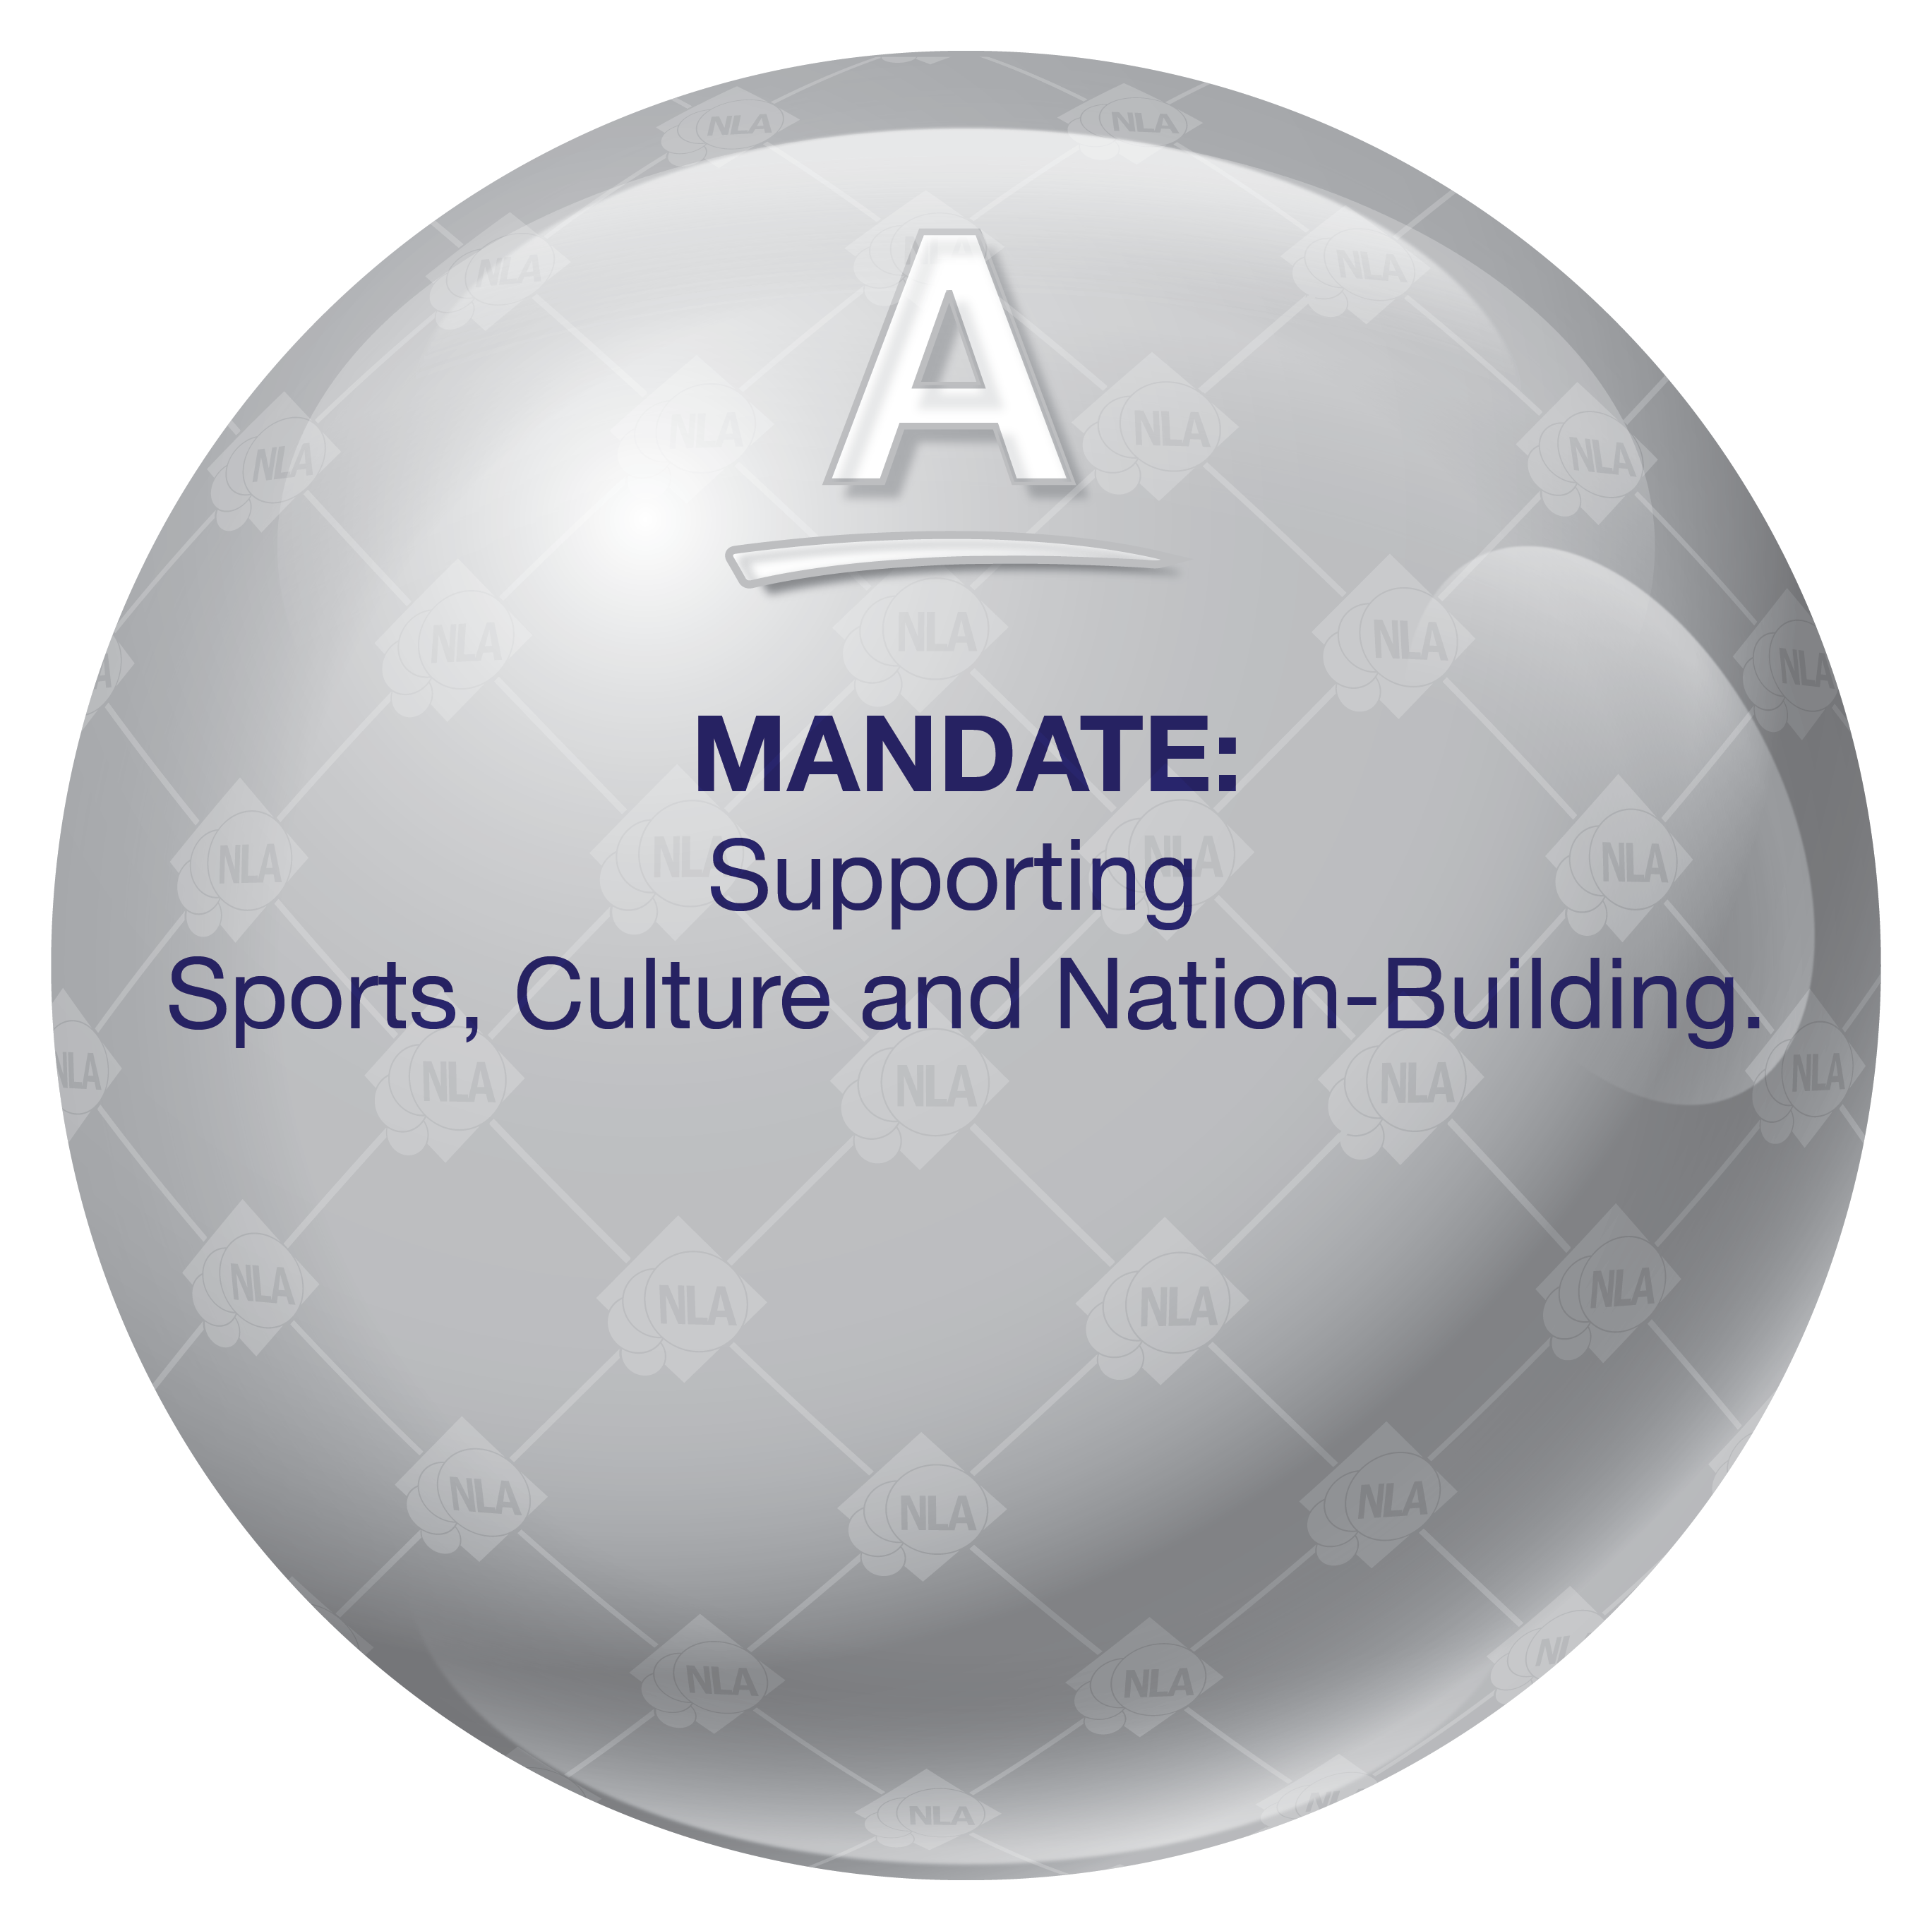 NLA GDA 2017 SITE RELOCATION 36x36 COMPANY STATEMENT 3D BALLS -03 - MANDATE